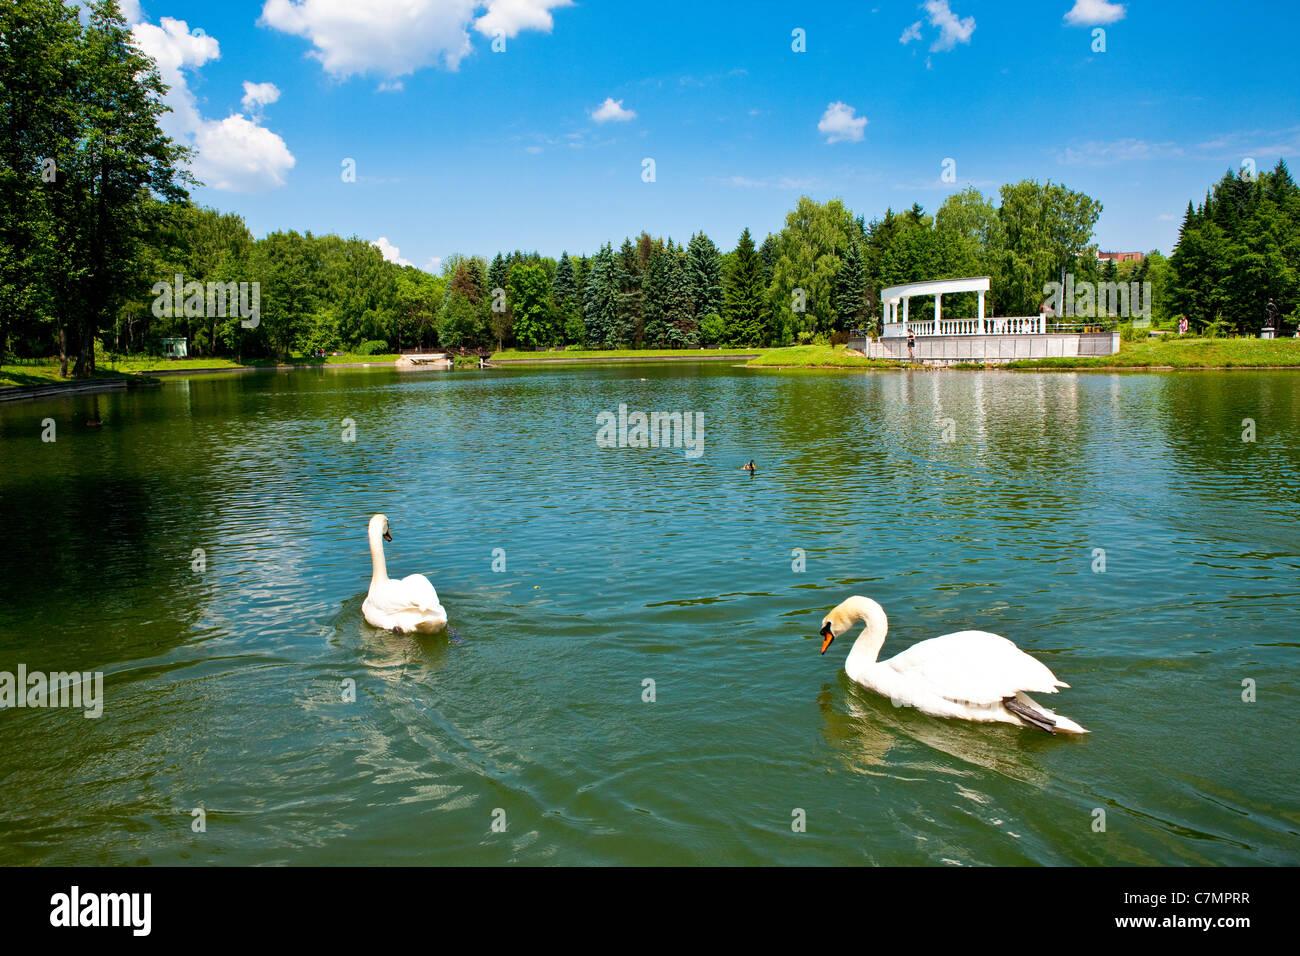 Swans at the Minsk Botanical Garden, Belarus - Stock Image